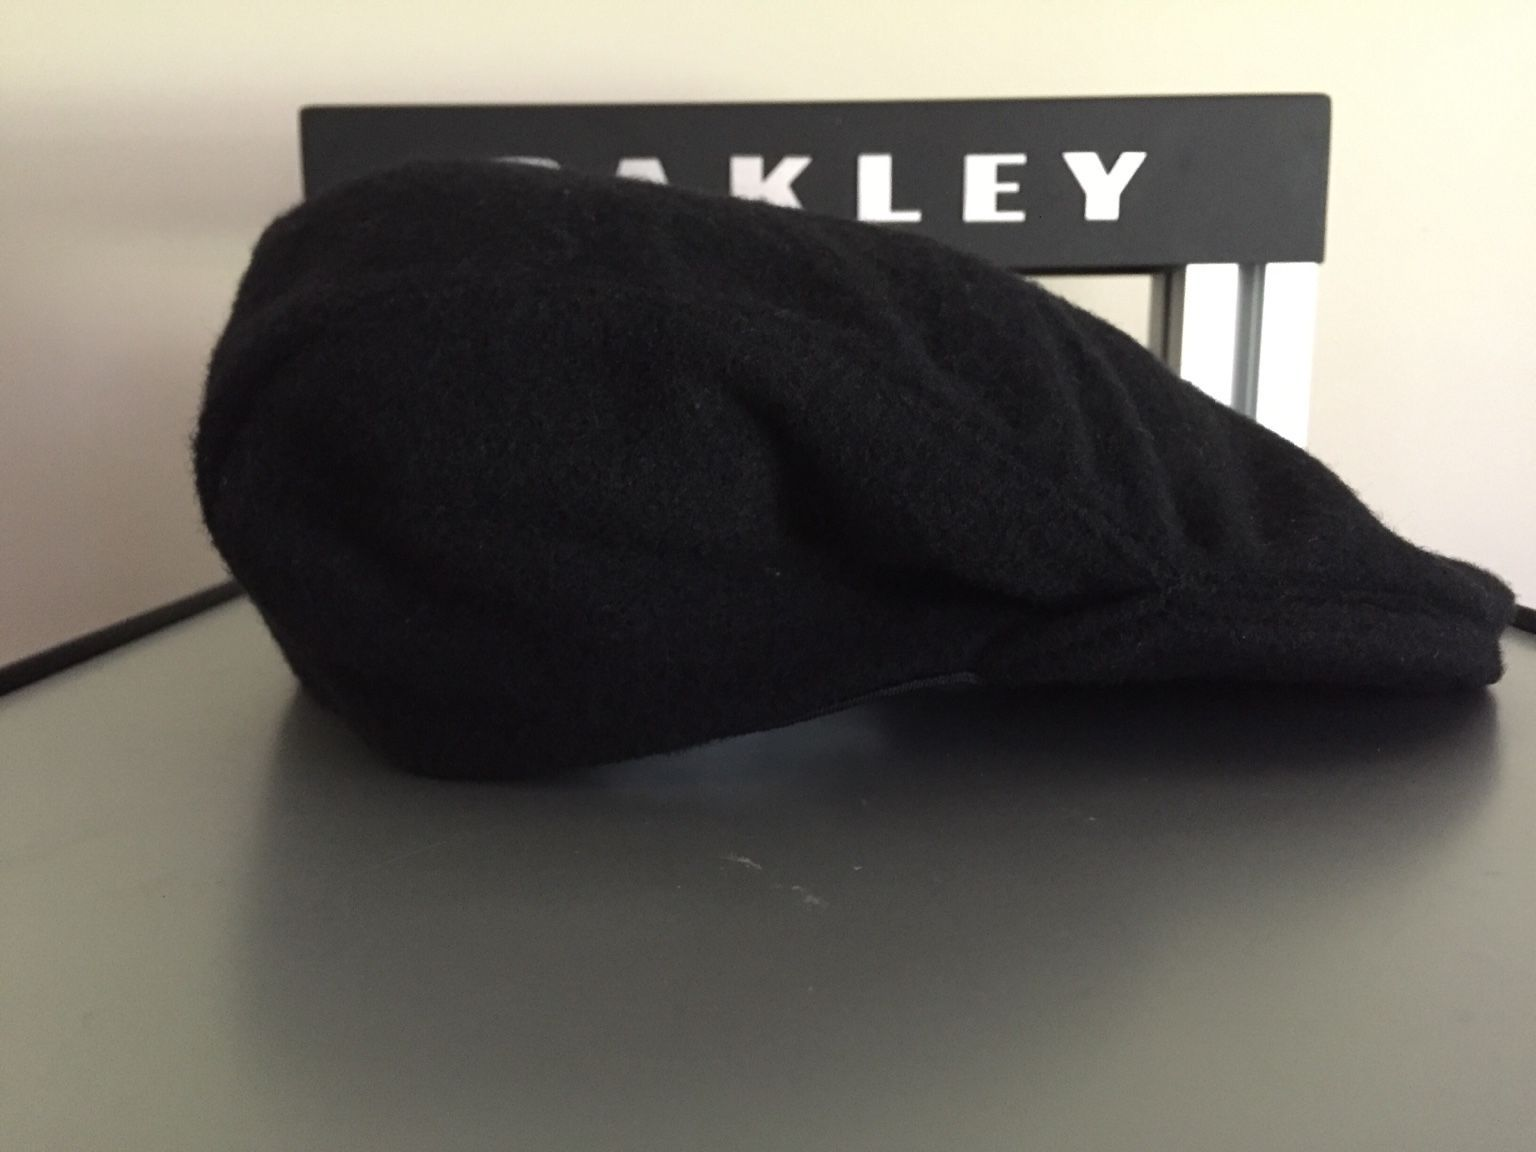 WTS: Oakley Static O Beret - 5fc91f7d99aa0f1738e18a401b5665c1.jpg